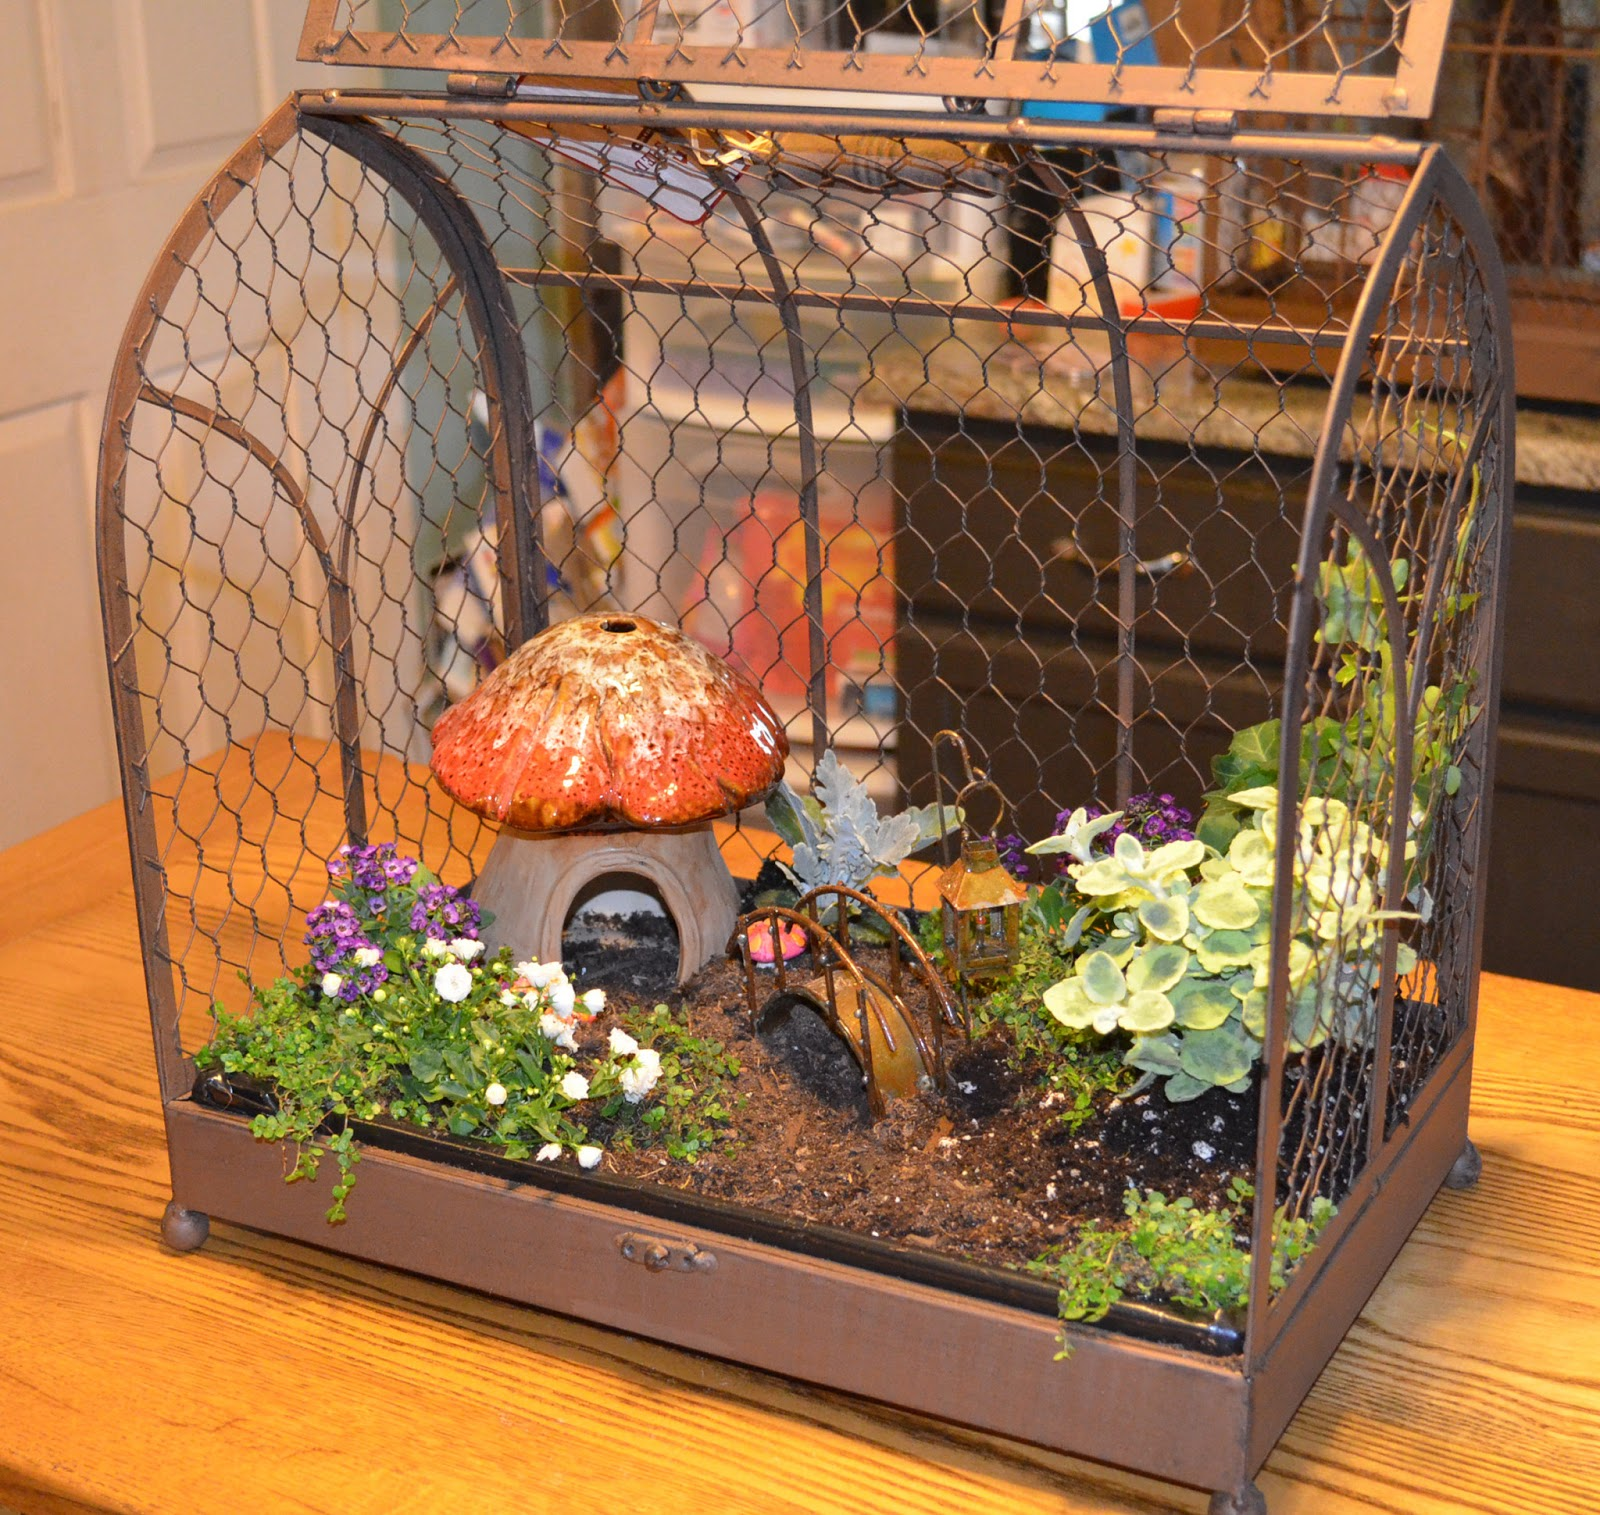 Edible Landscaping And Fairy Gardens: Stamp-n-Design: Indoor Fairy Garden